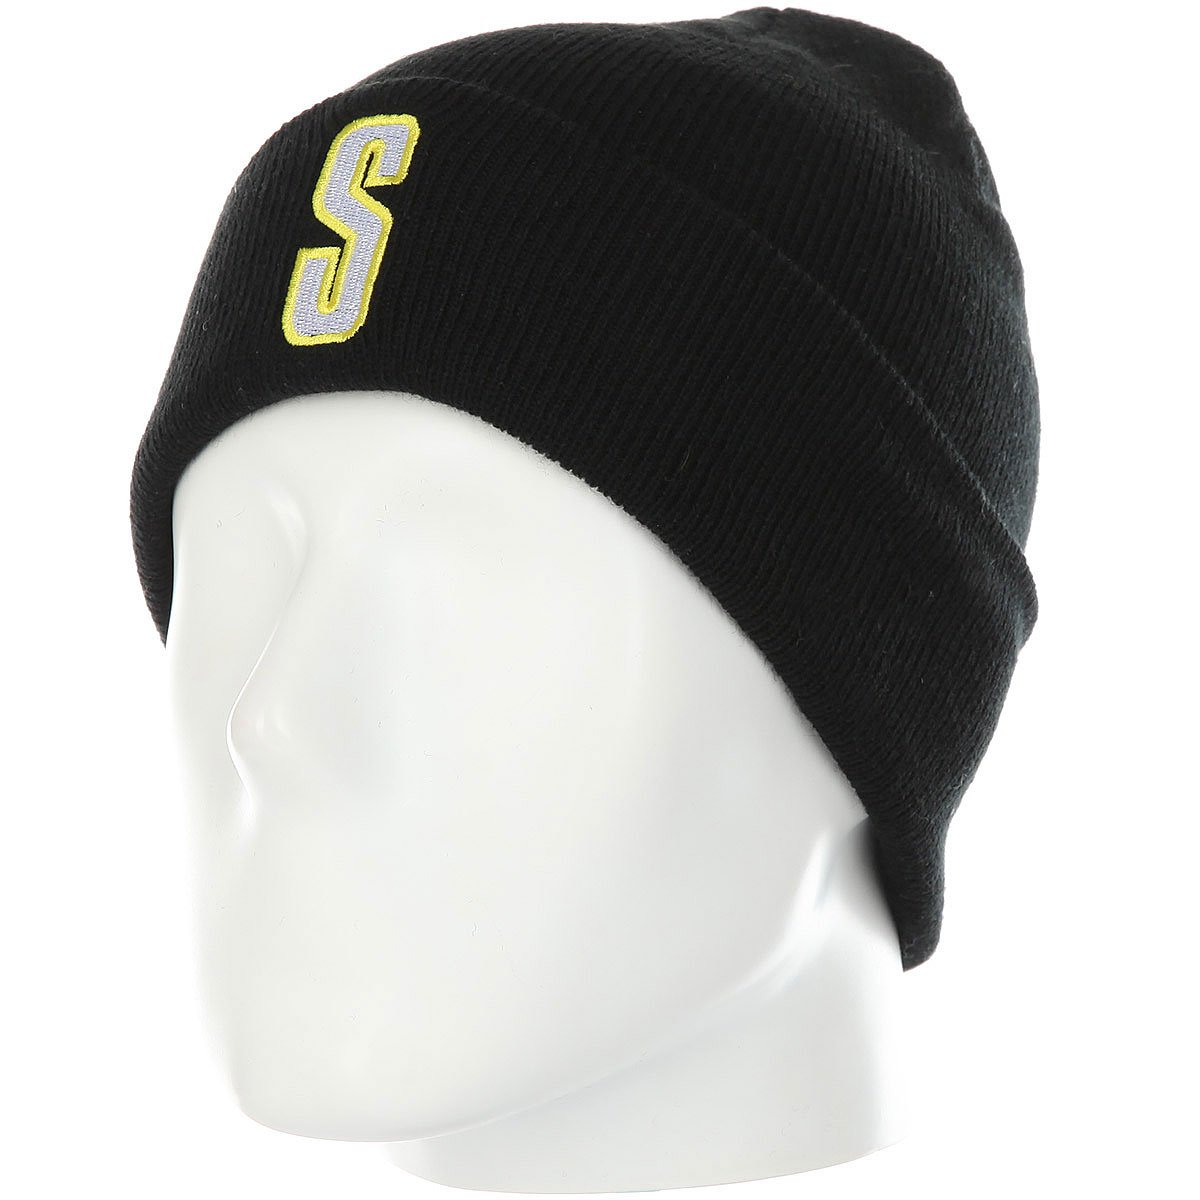 922404a3935 Купить шапку Stussy Vintage S Cuff Beanie Black в интернет-магазине ...